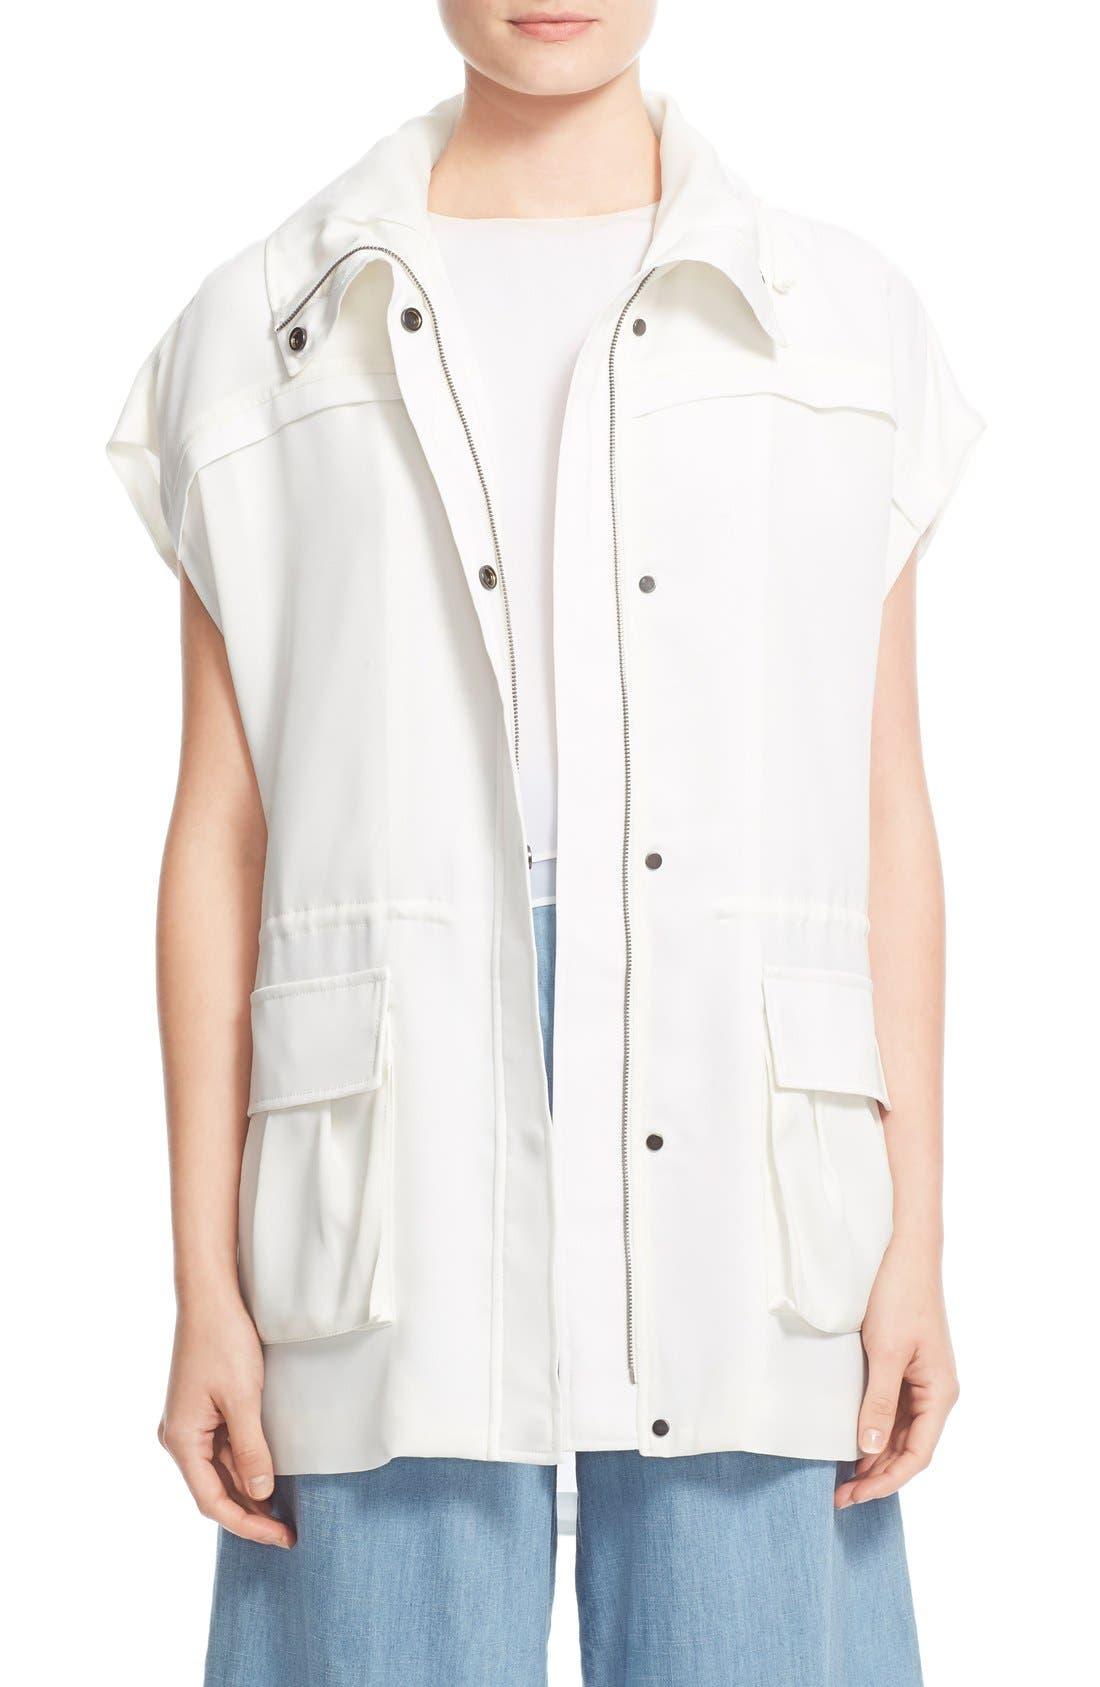 'Tate' Sleeveless Hooded Cargo Jacket, Main, color, 100